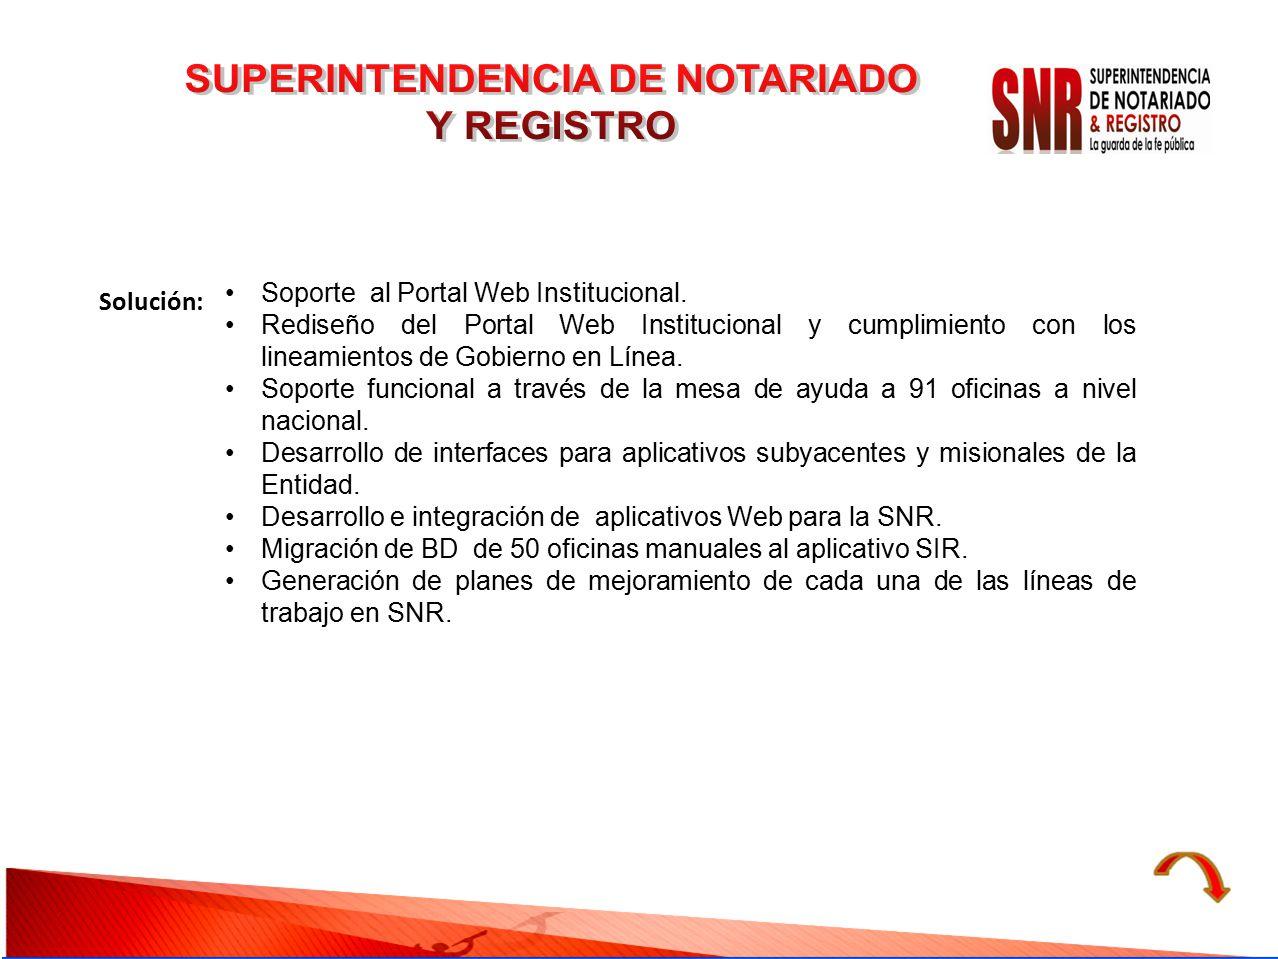 SUPERINTENDENCIA DE NOTARIADO